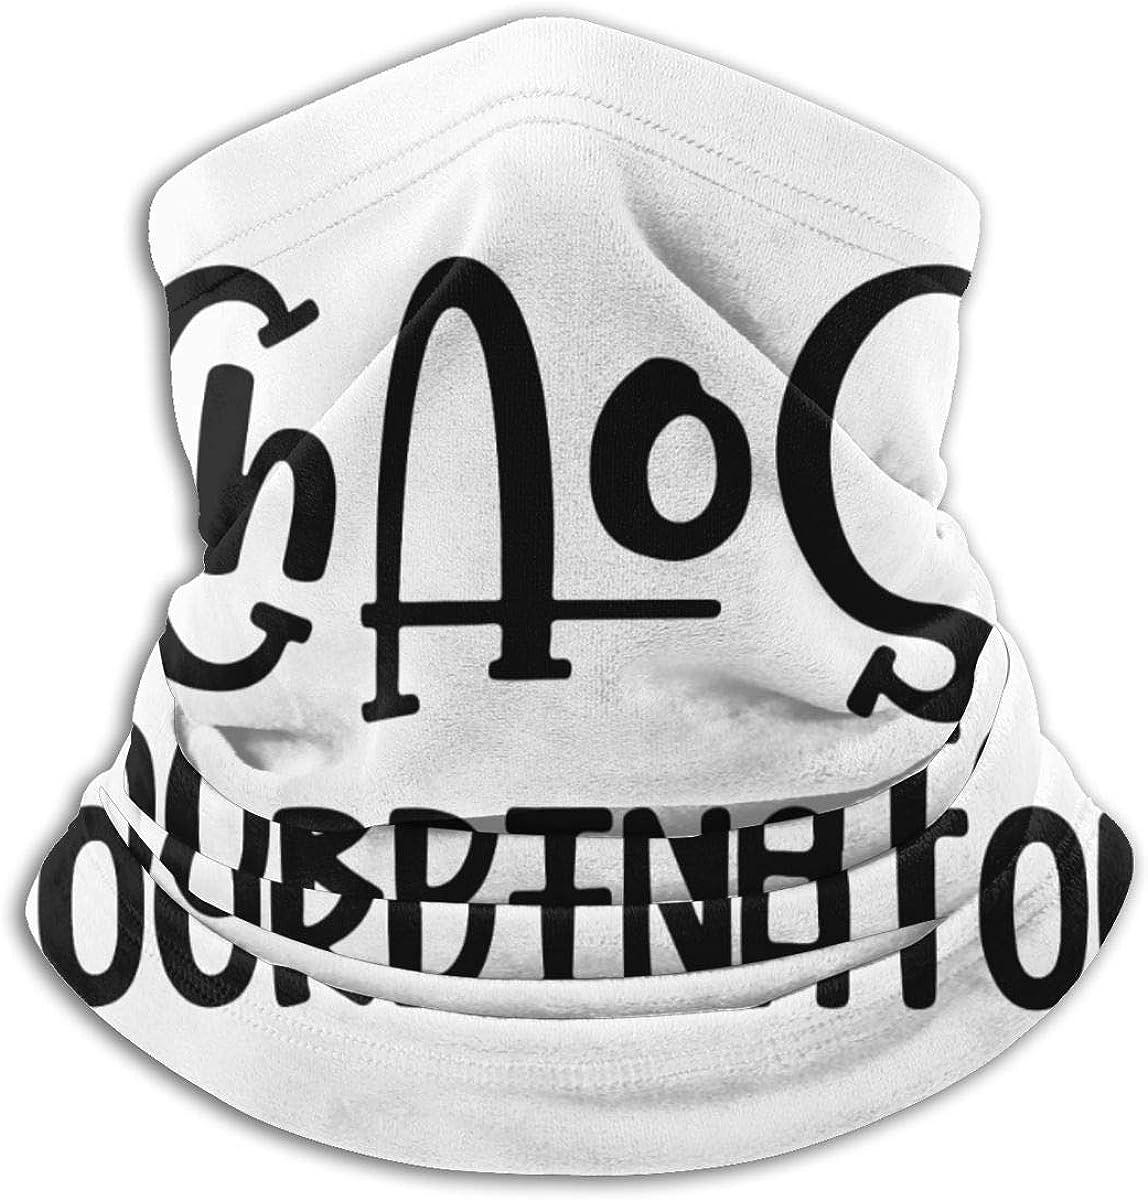 Chaos Coordinator Black Multi-function Neck Warmer Gaiter Polyester Neck Warmer Windproof Winter Neck Gaiter Cold Weather Scarf For Men Women